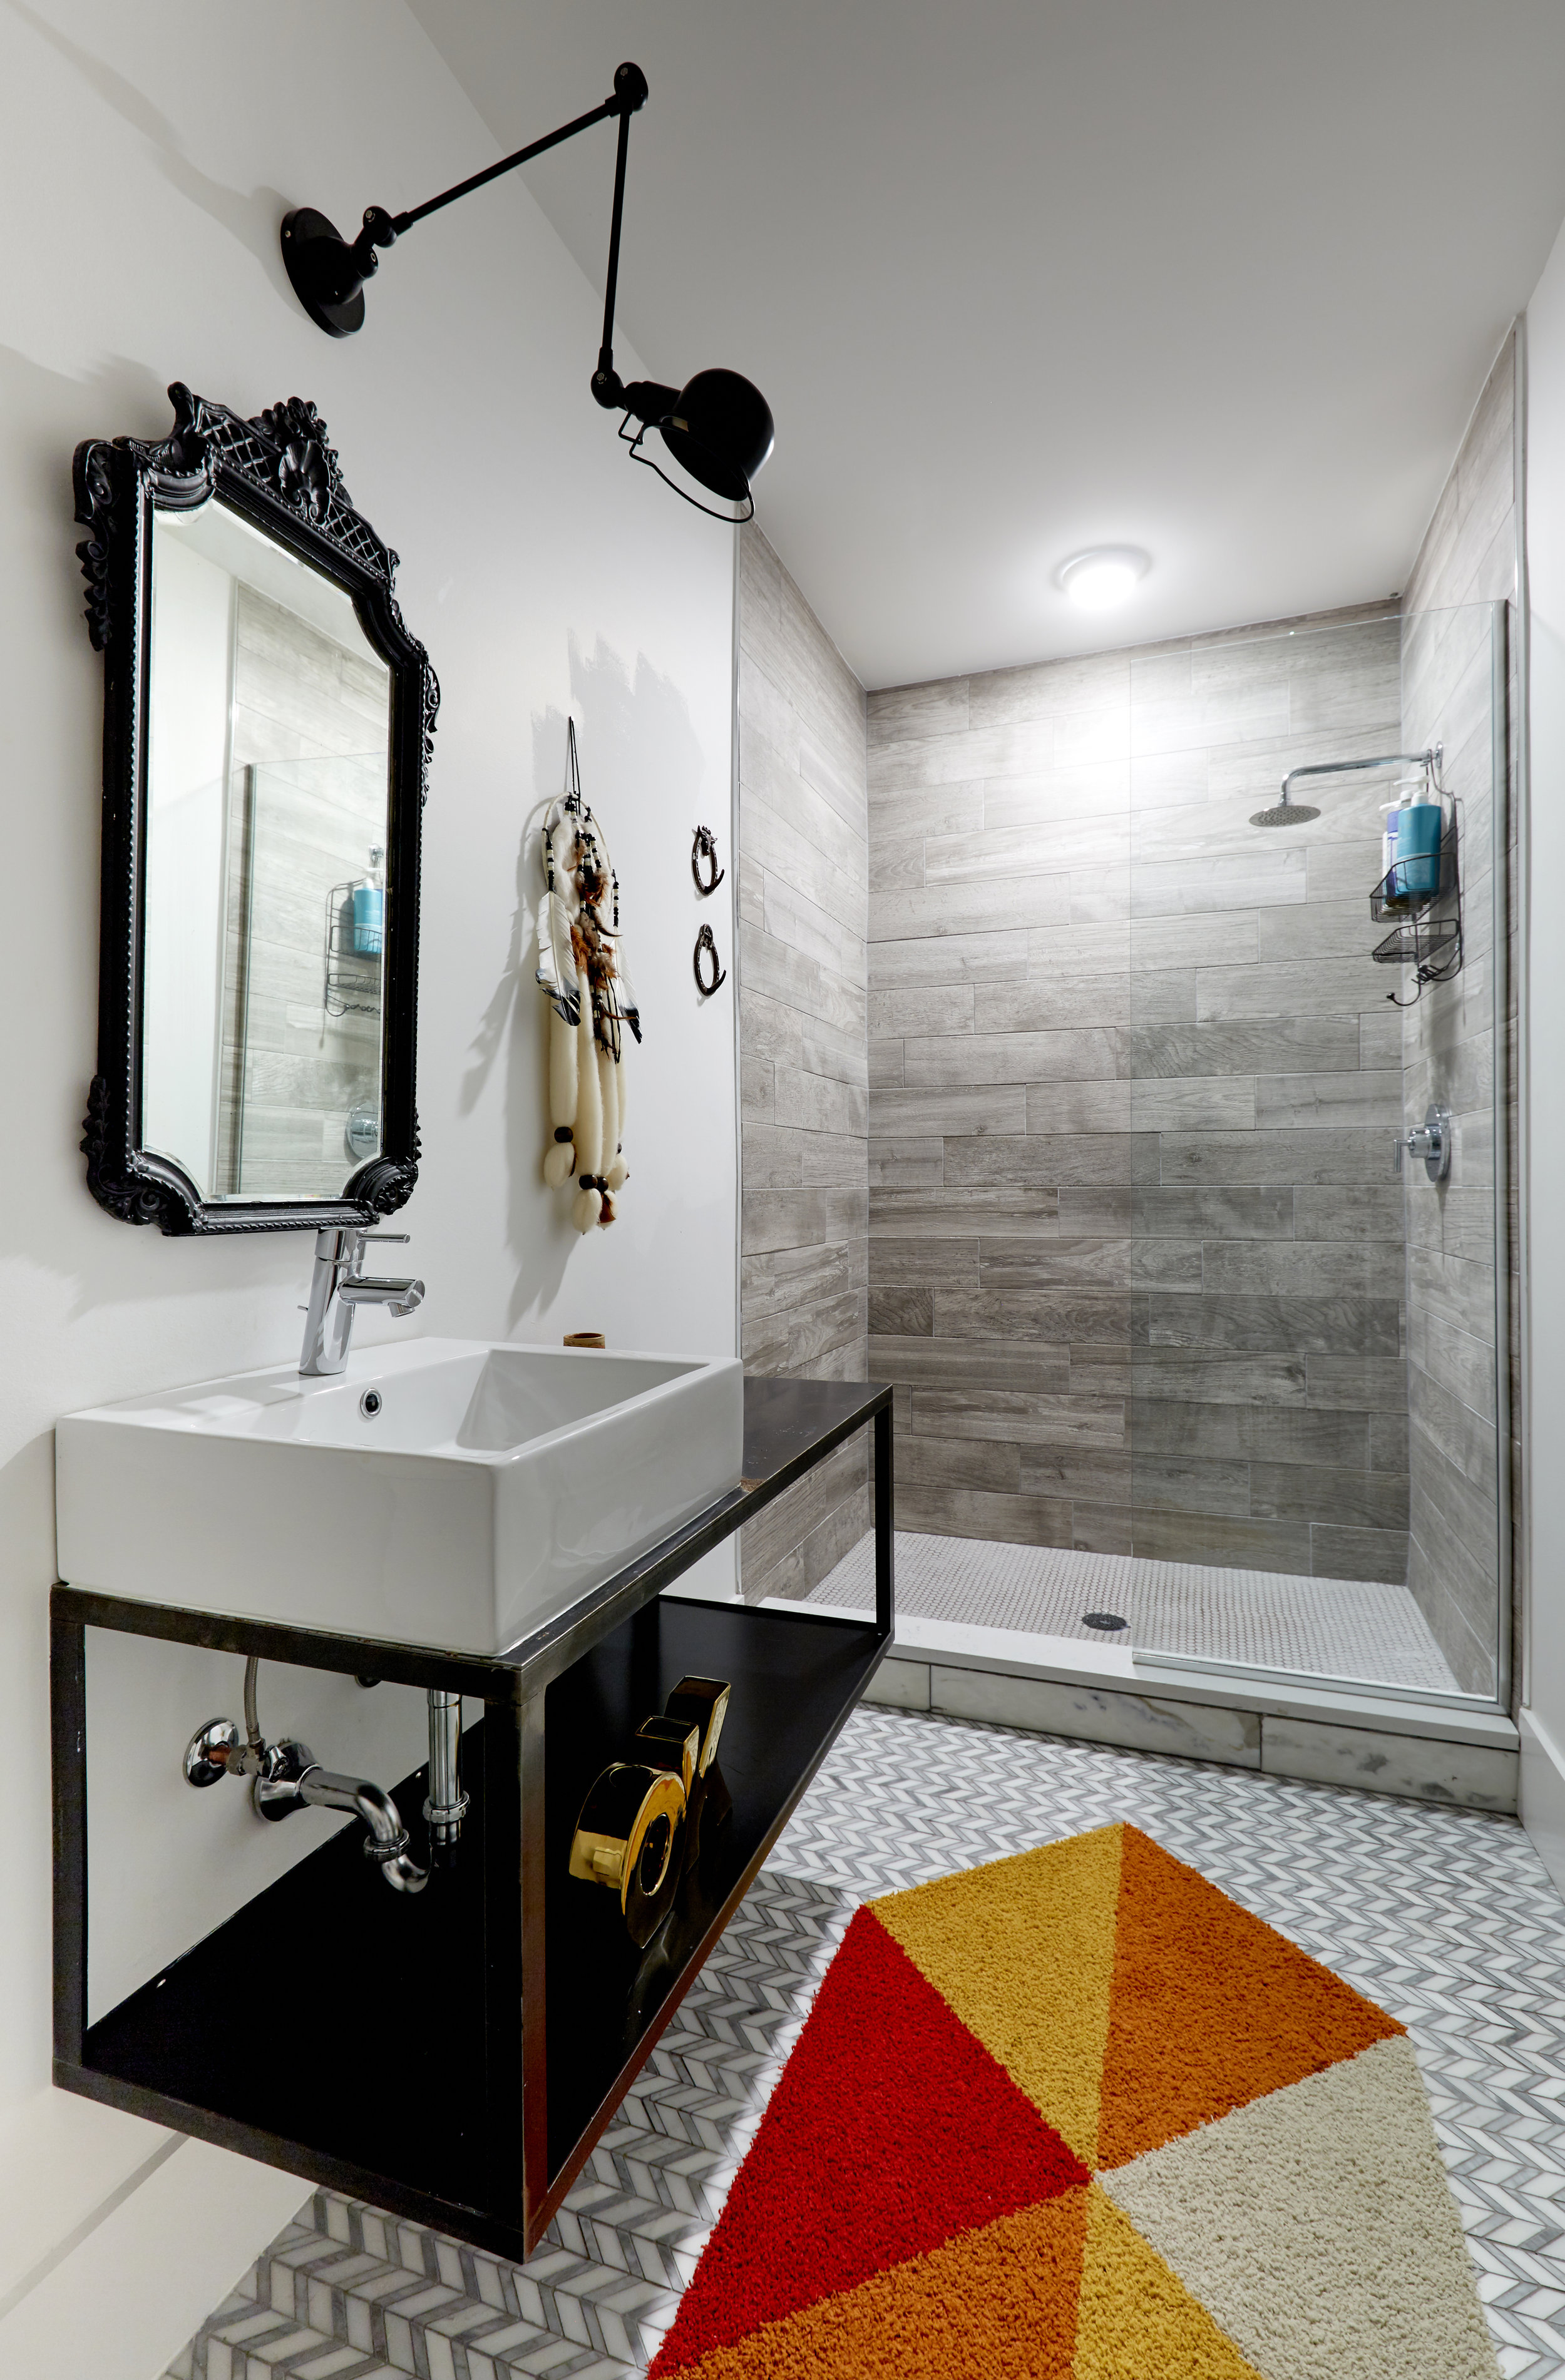 El_Motel_Bathroom_888_B.jpg